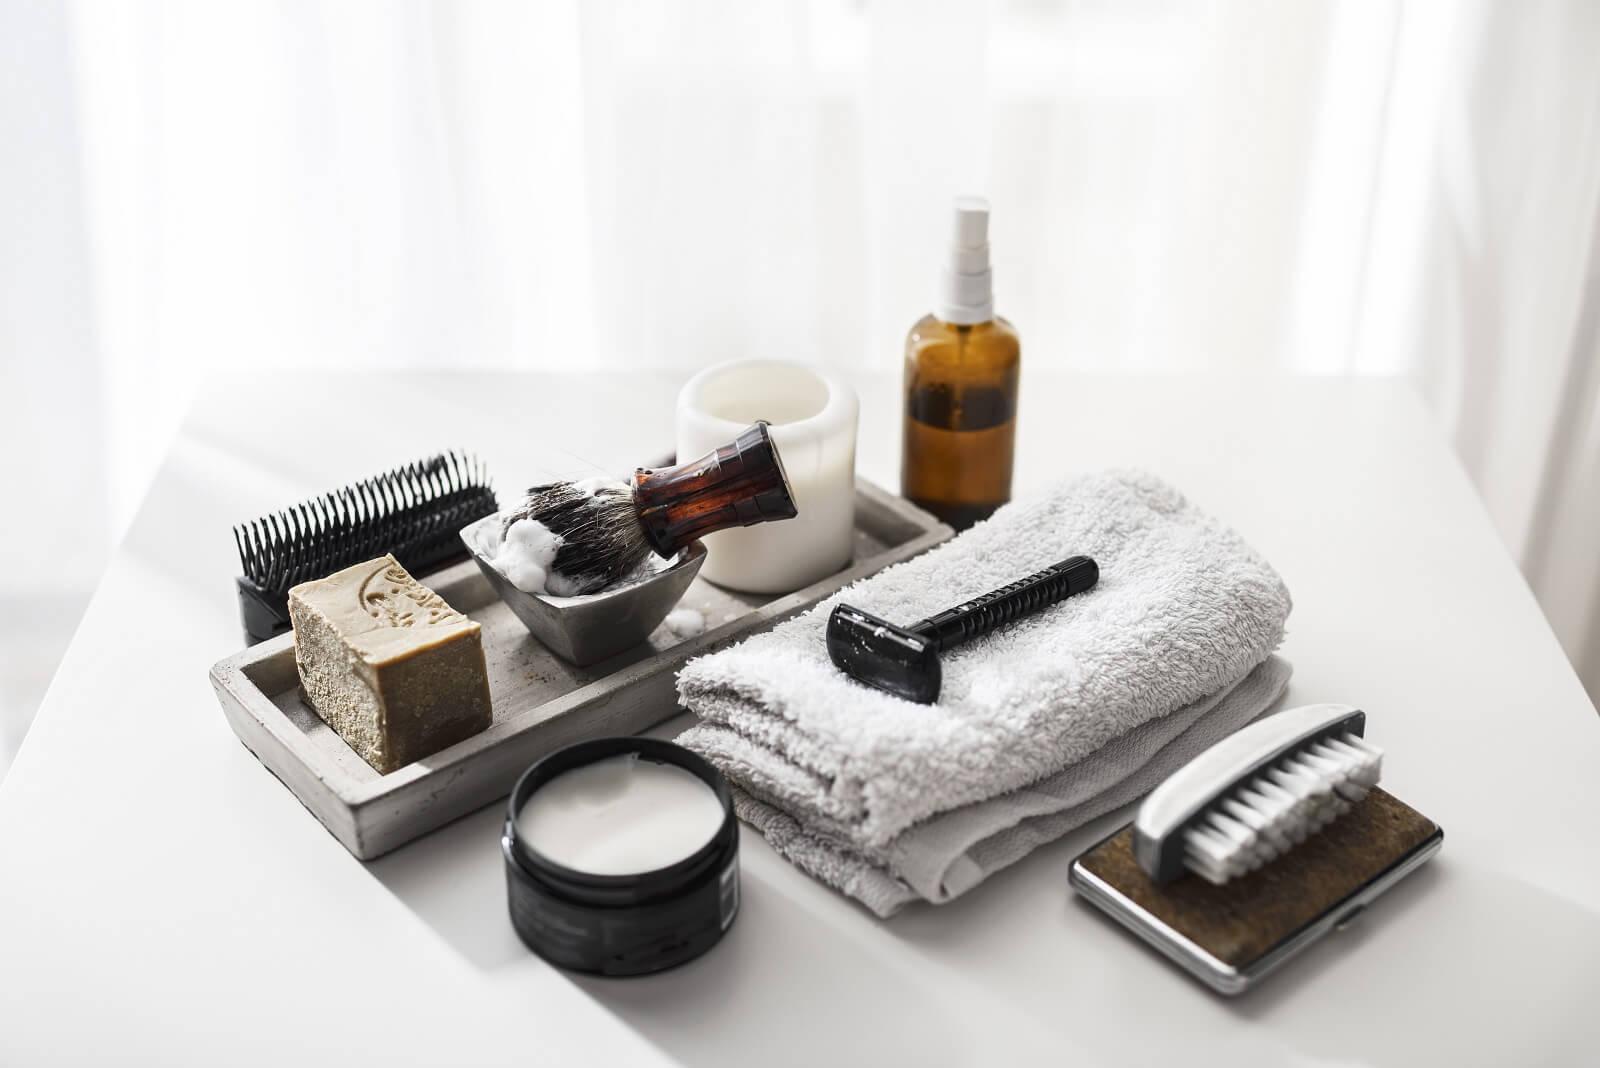 Bartpflege Sets - Welches Set passt zu mir?